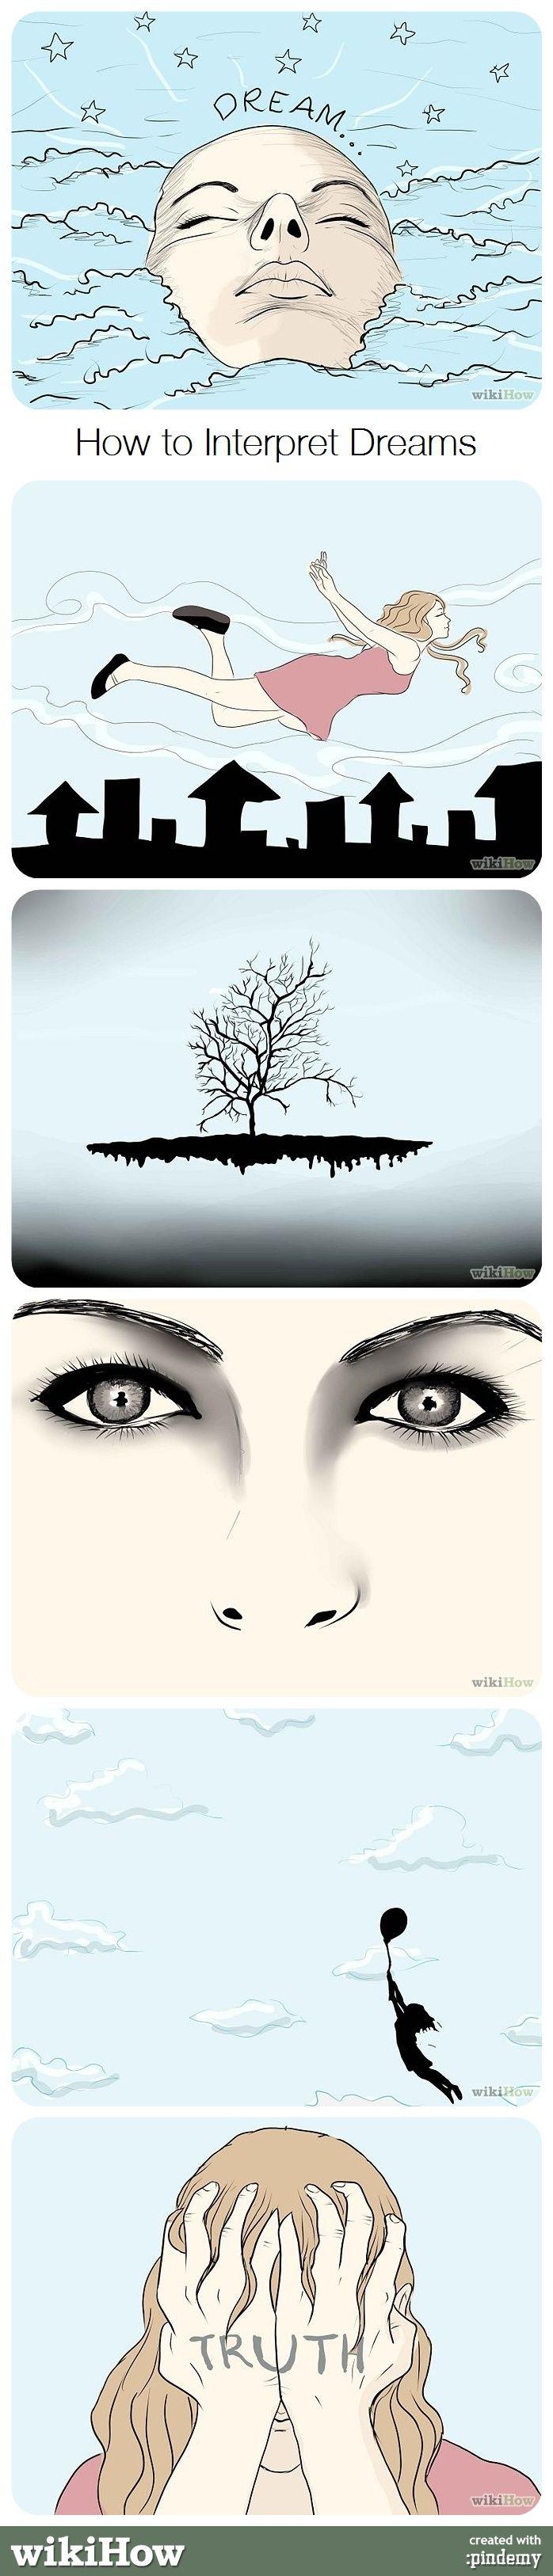 White dress dream meaning - Interpret Your Dreams Dream Interpretationdream